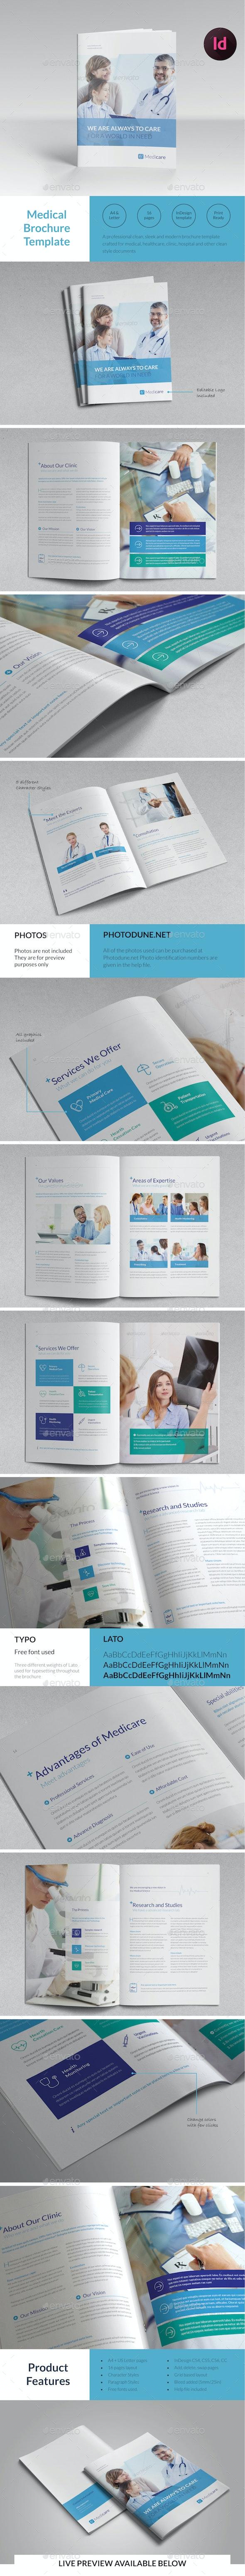 Medical Brochure Template - Informational Brochures